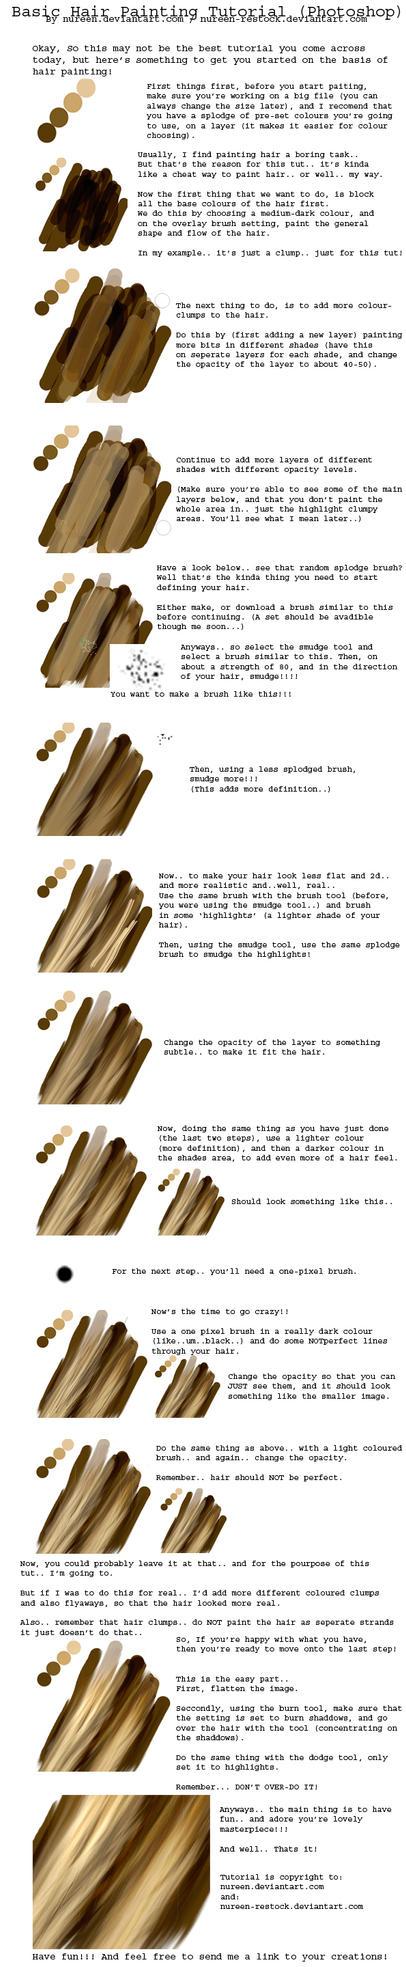 Basic Hair Tut - Photoshop by nureen-REStock